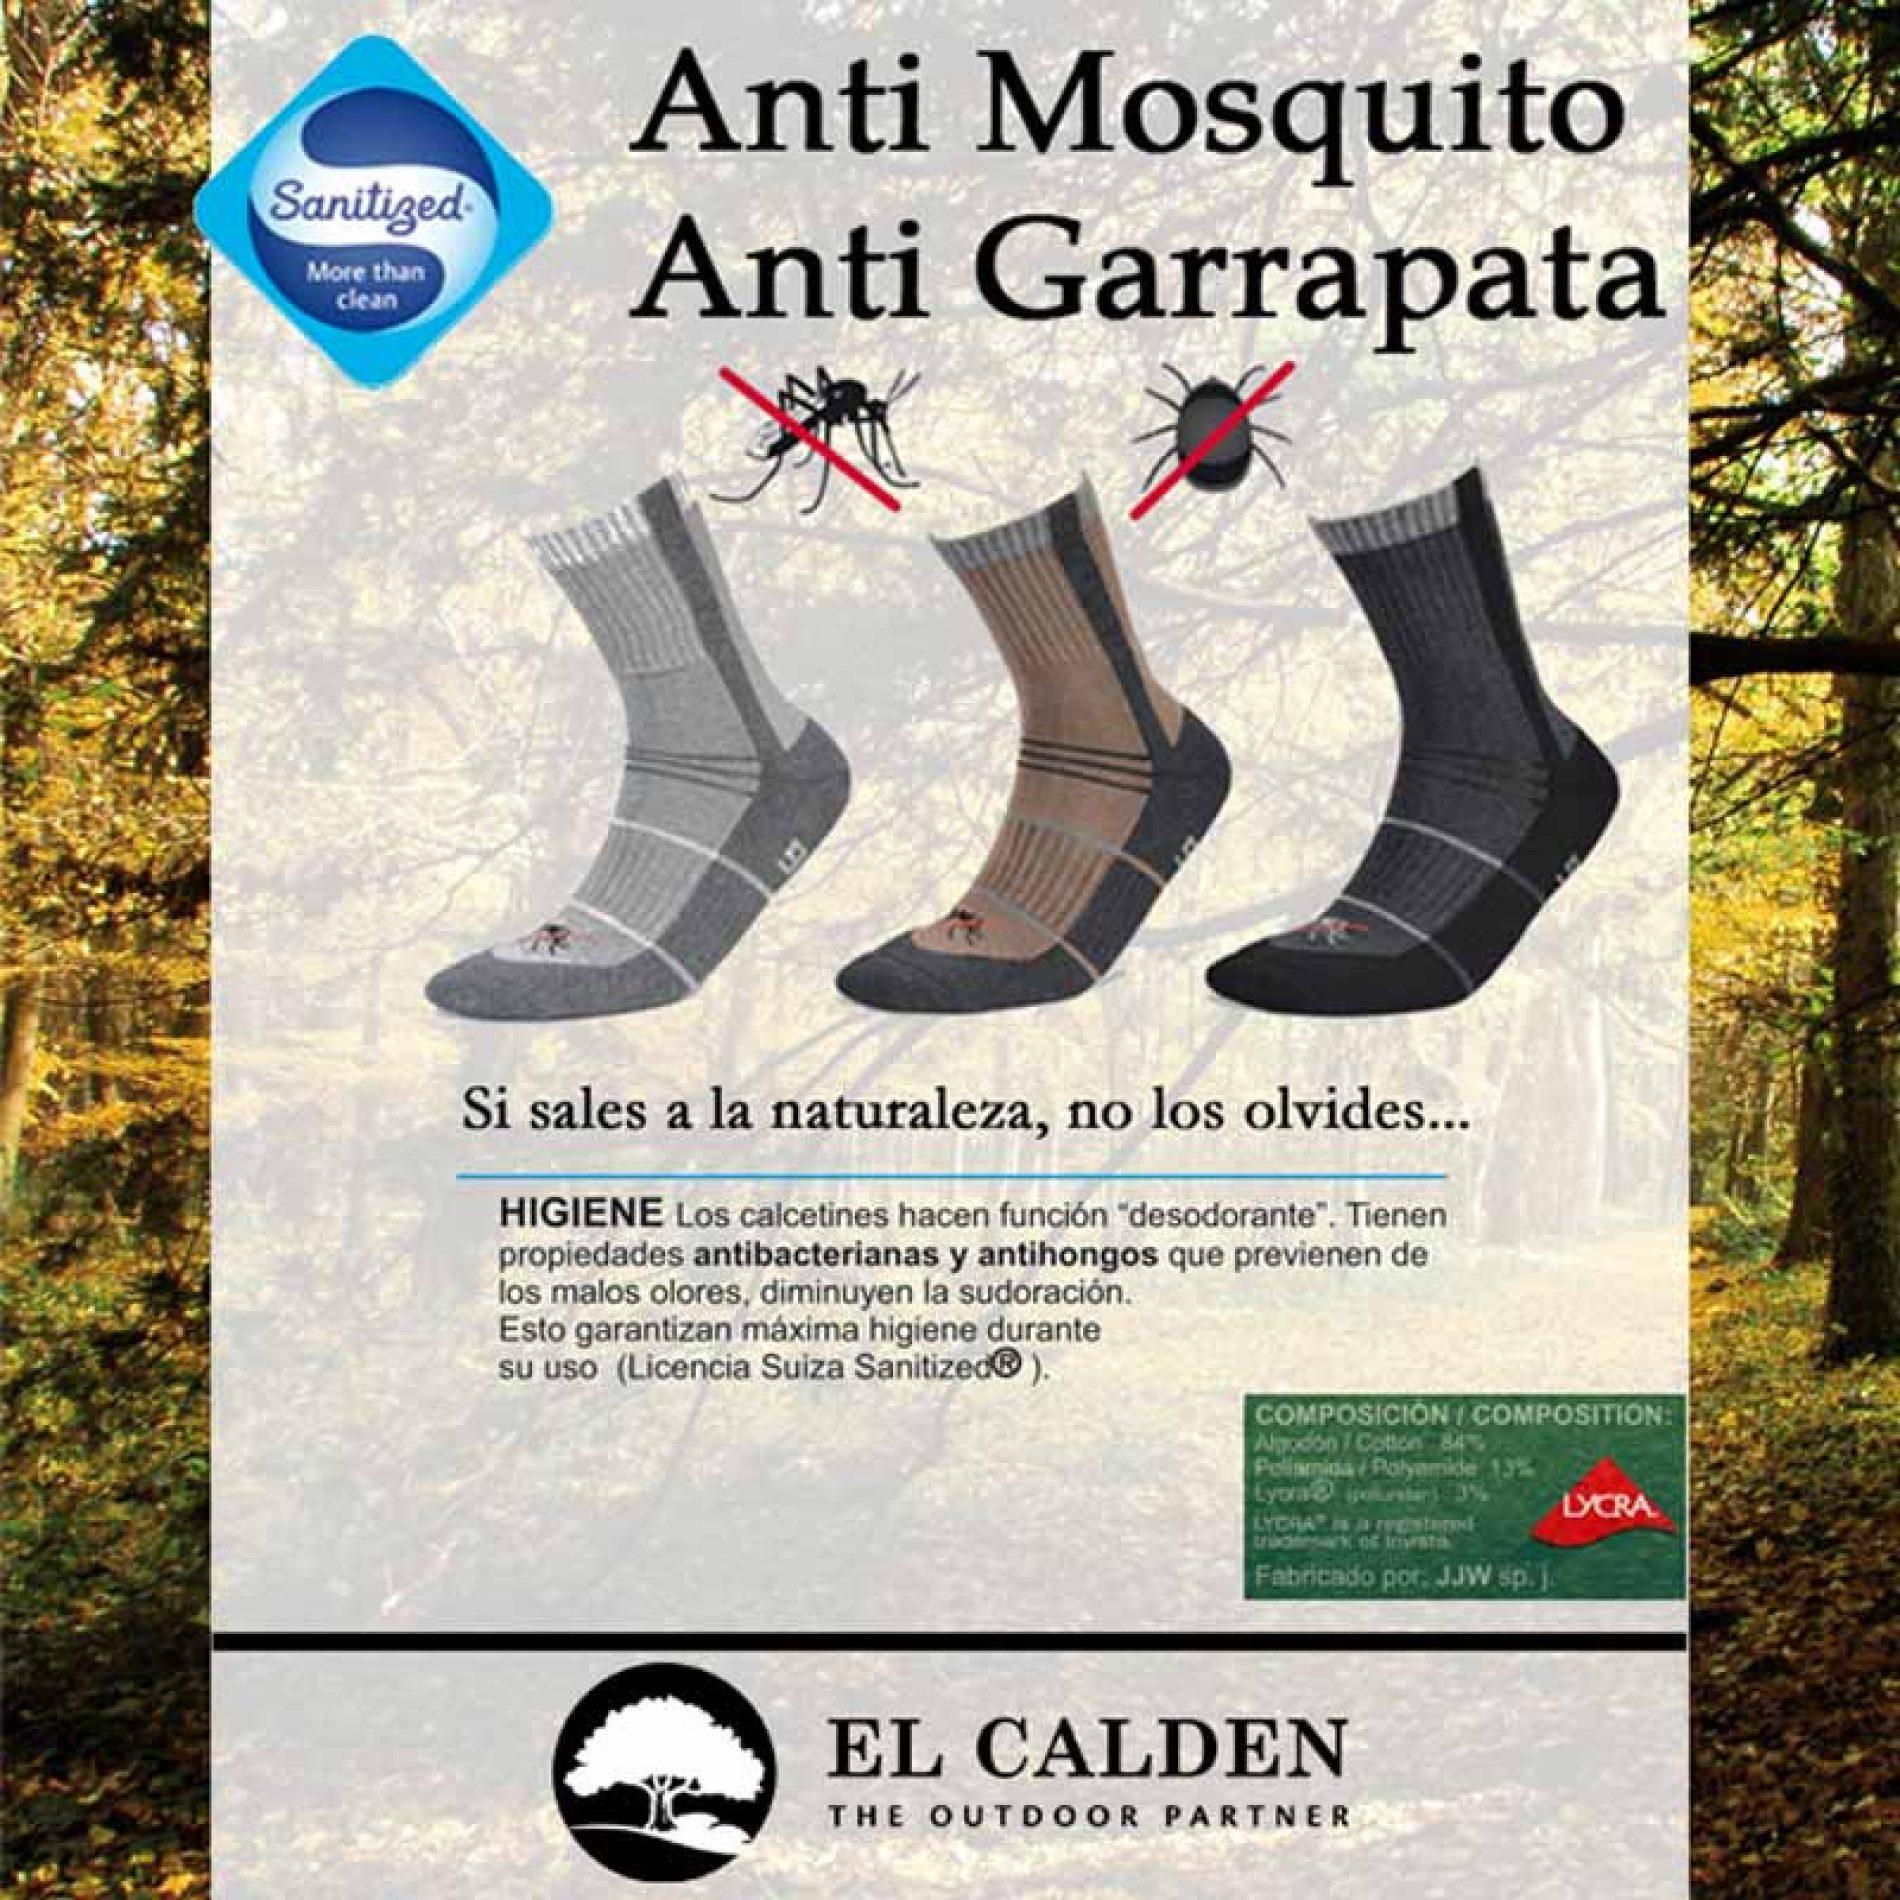 Calcetines anti mosquitos y garrapatas Deomed